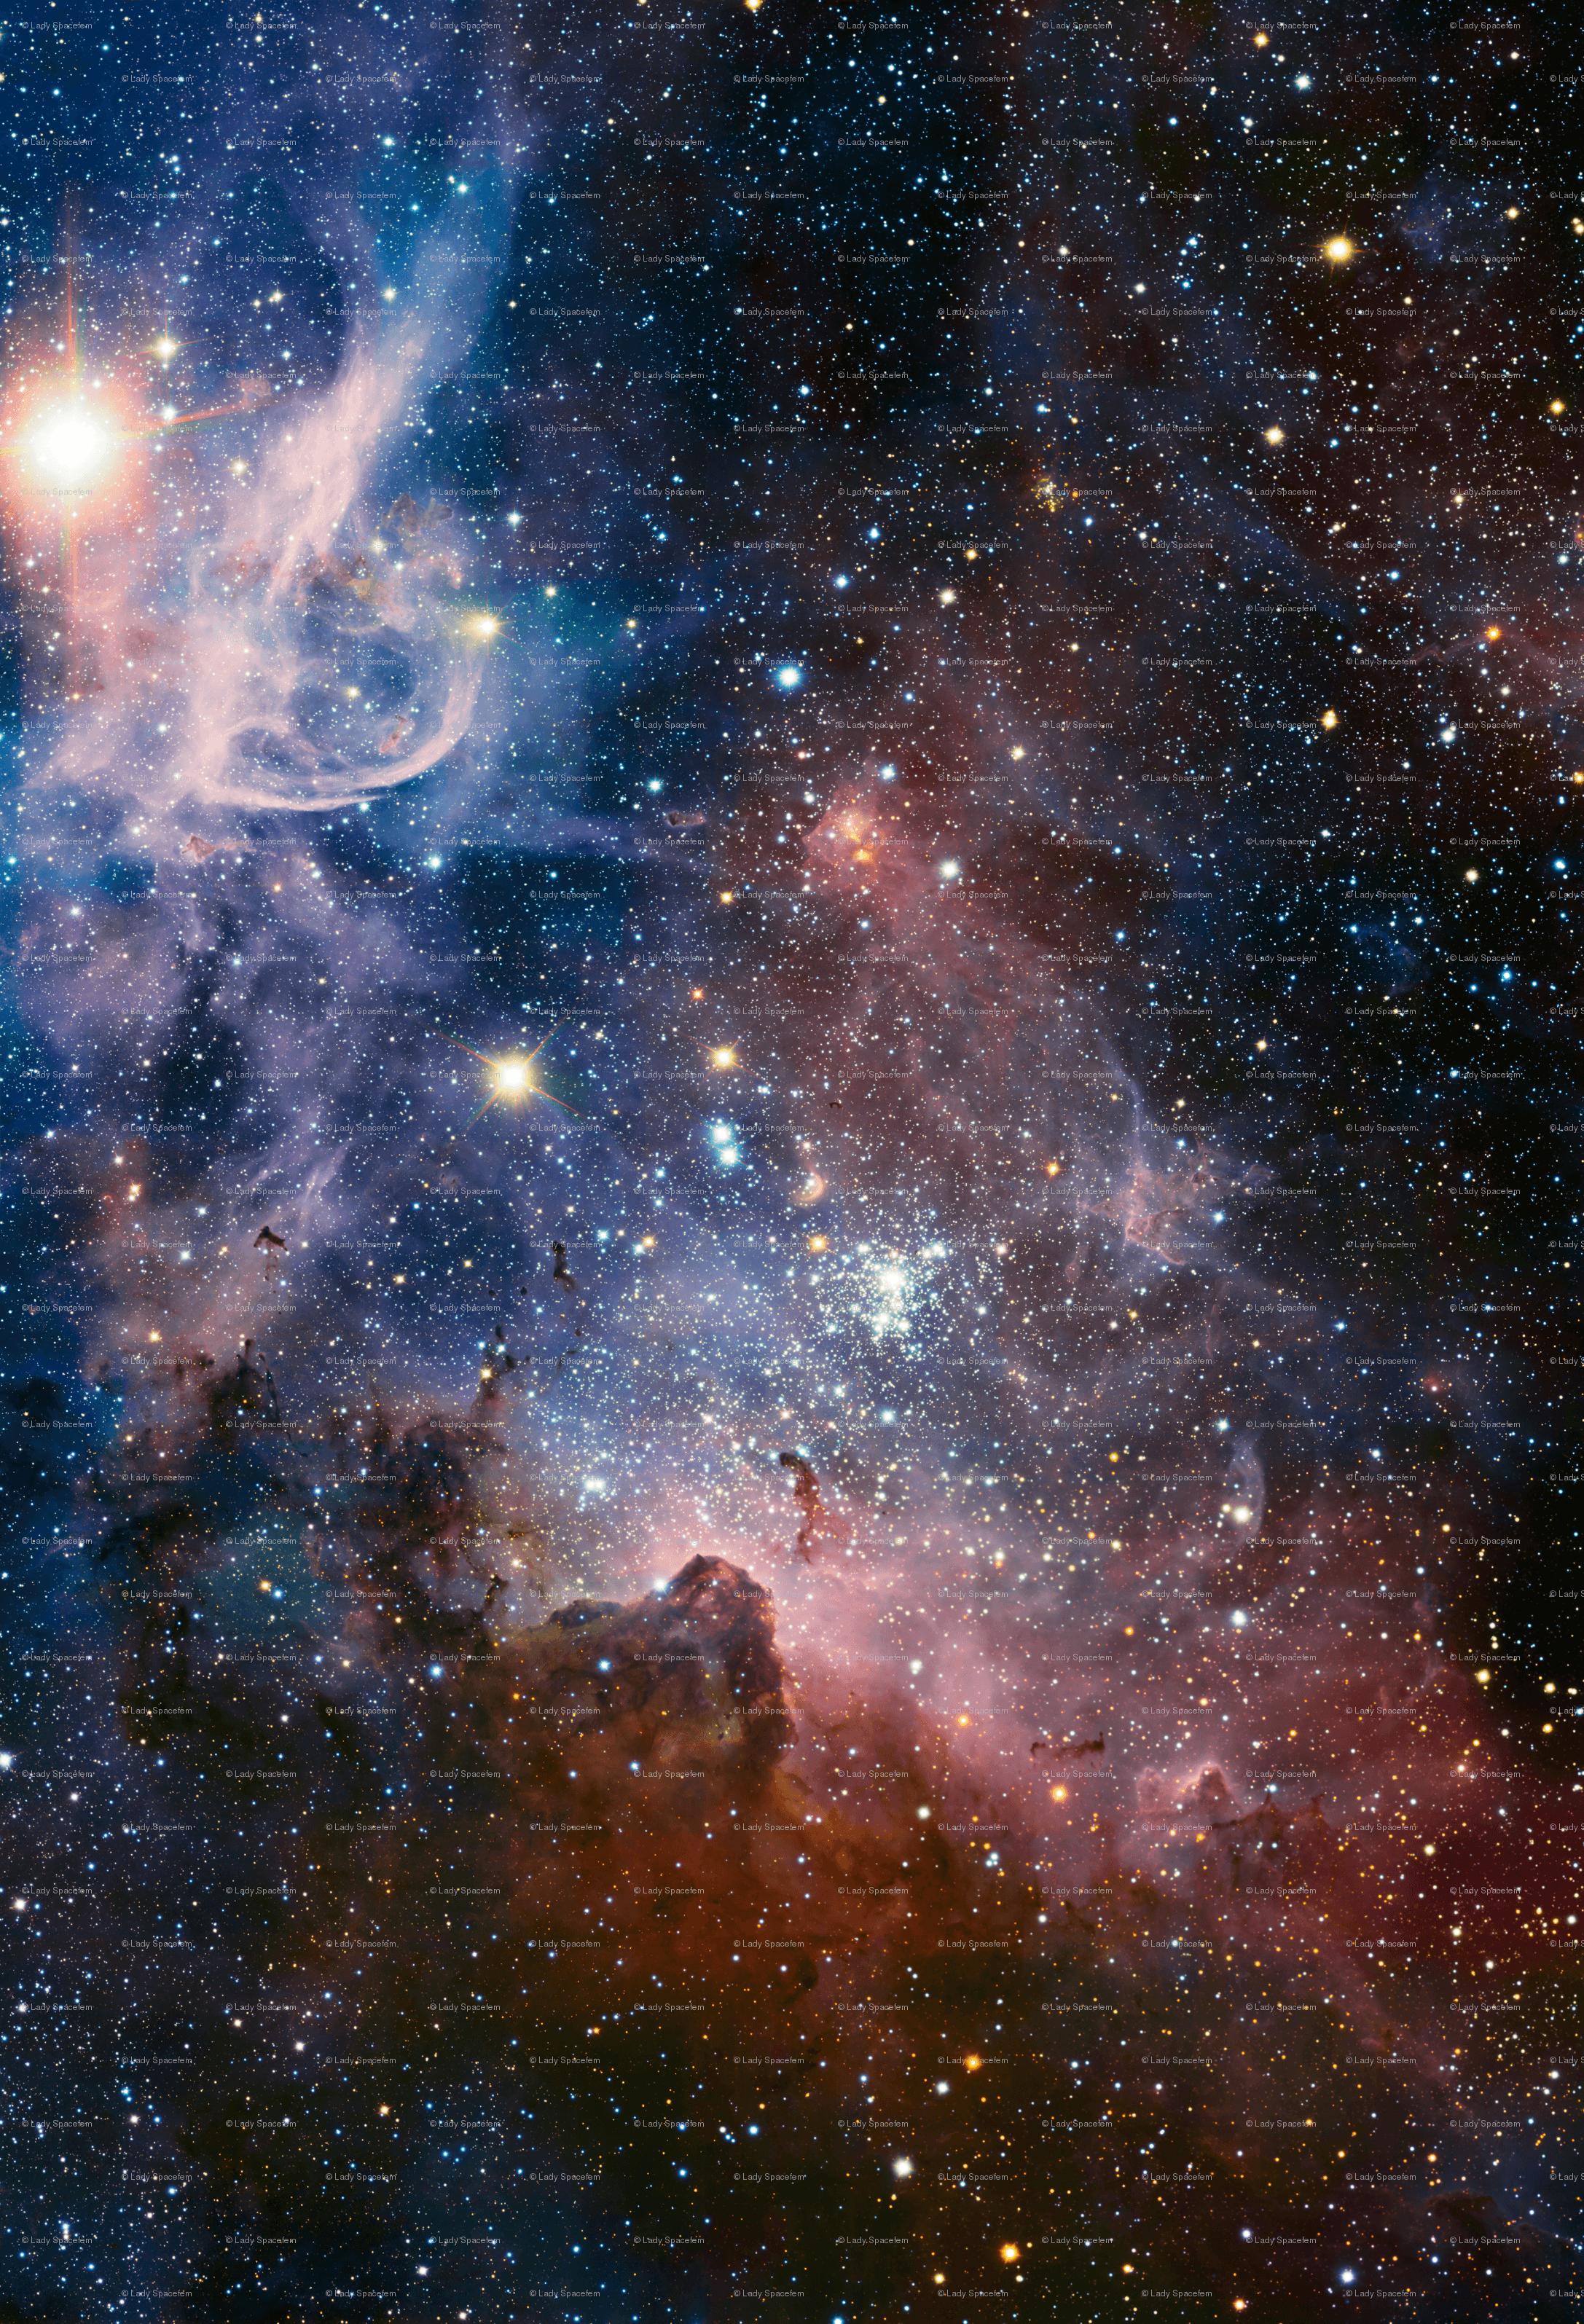 2174x3190 Carina Nebula 58x85 inch vải - spacefem